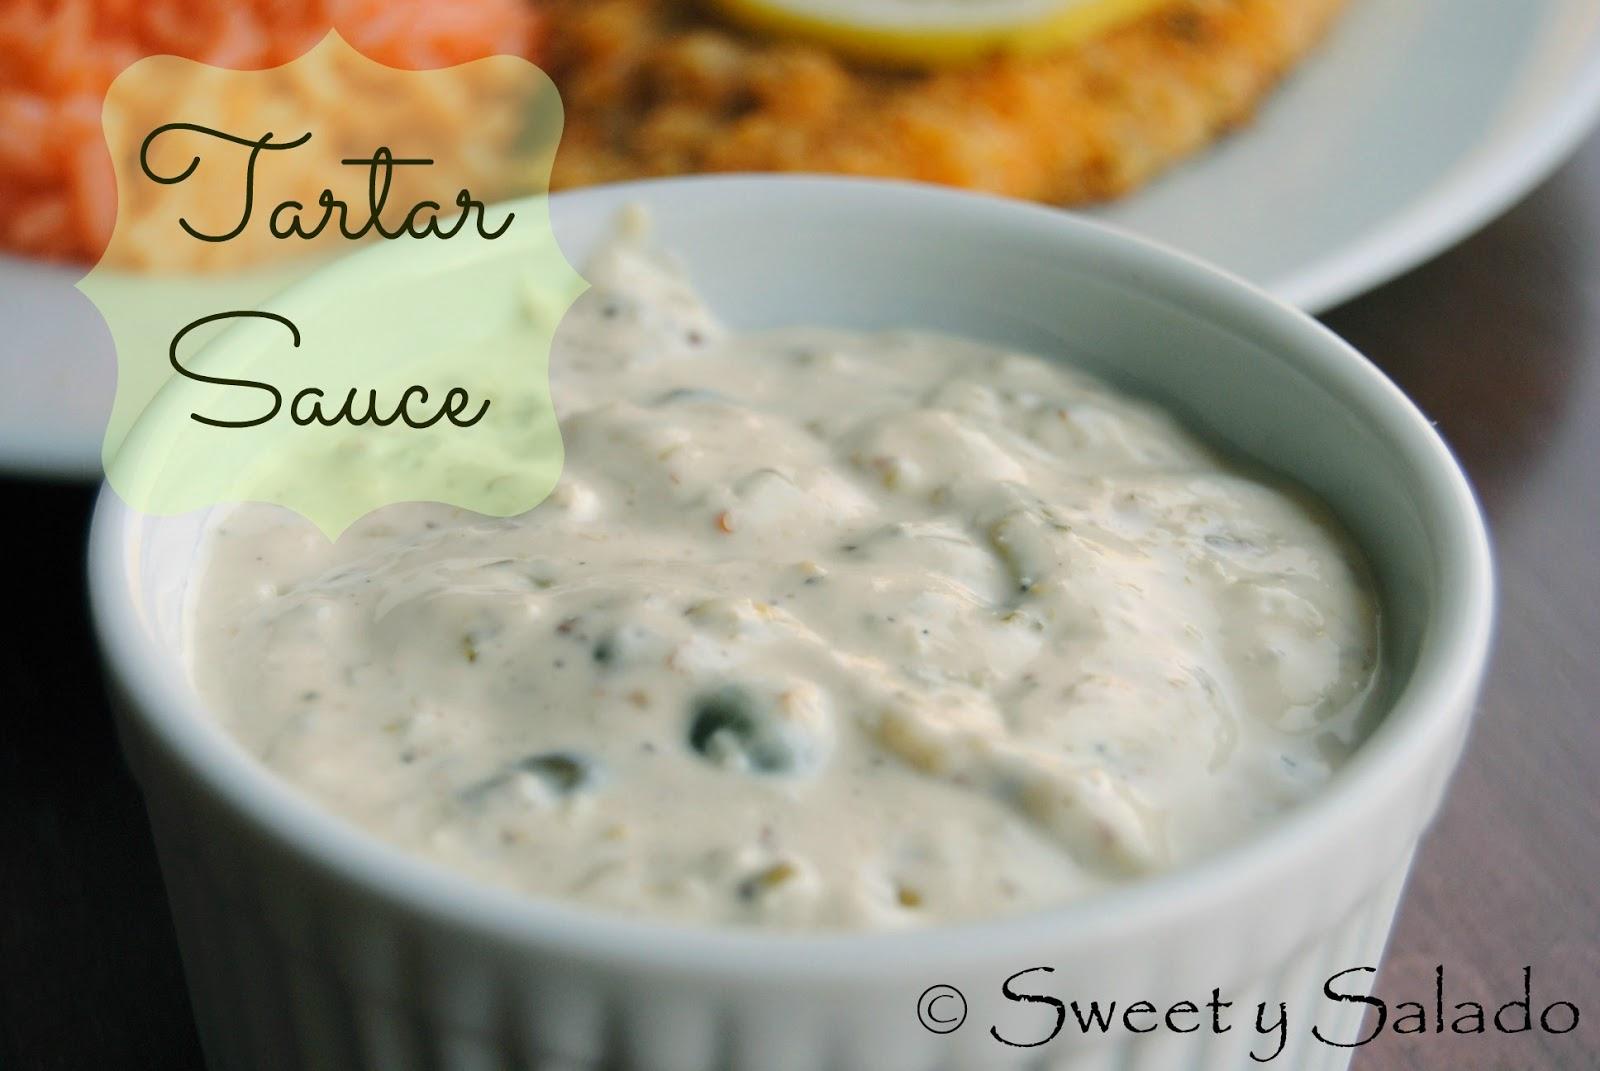 Sweet y Salado: Tartar Sauce